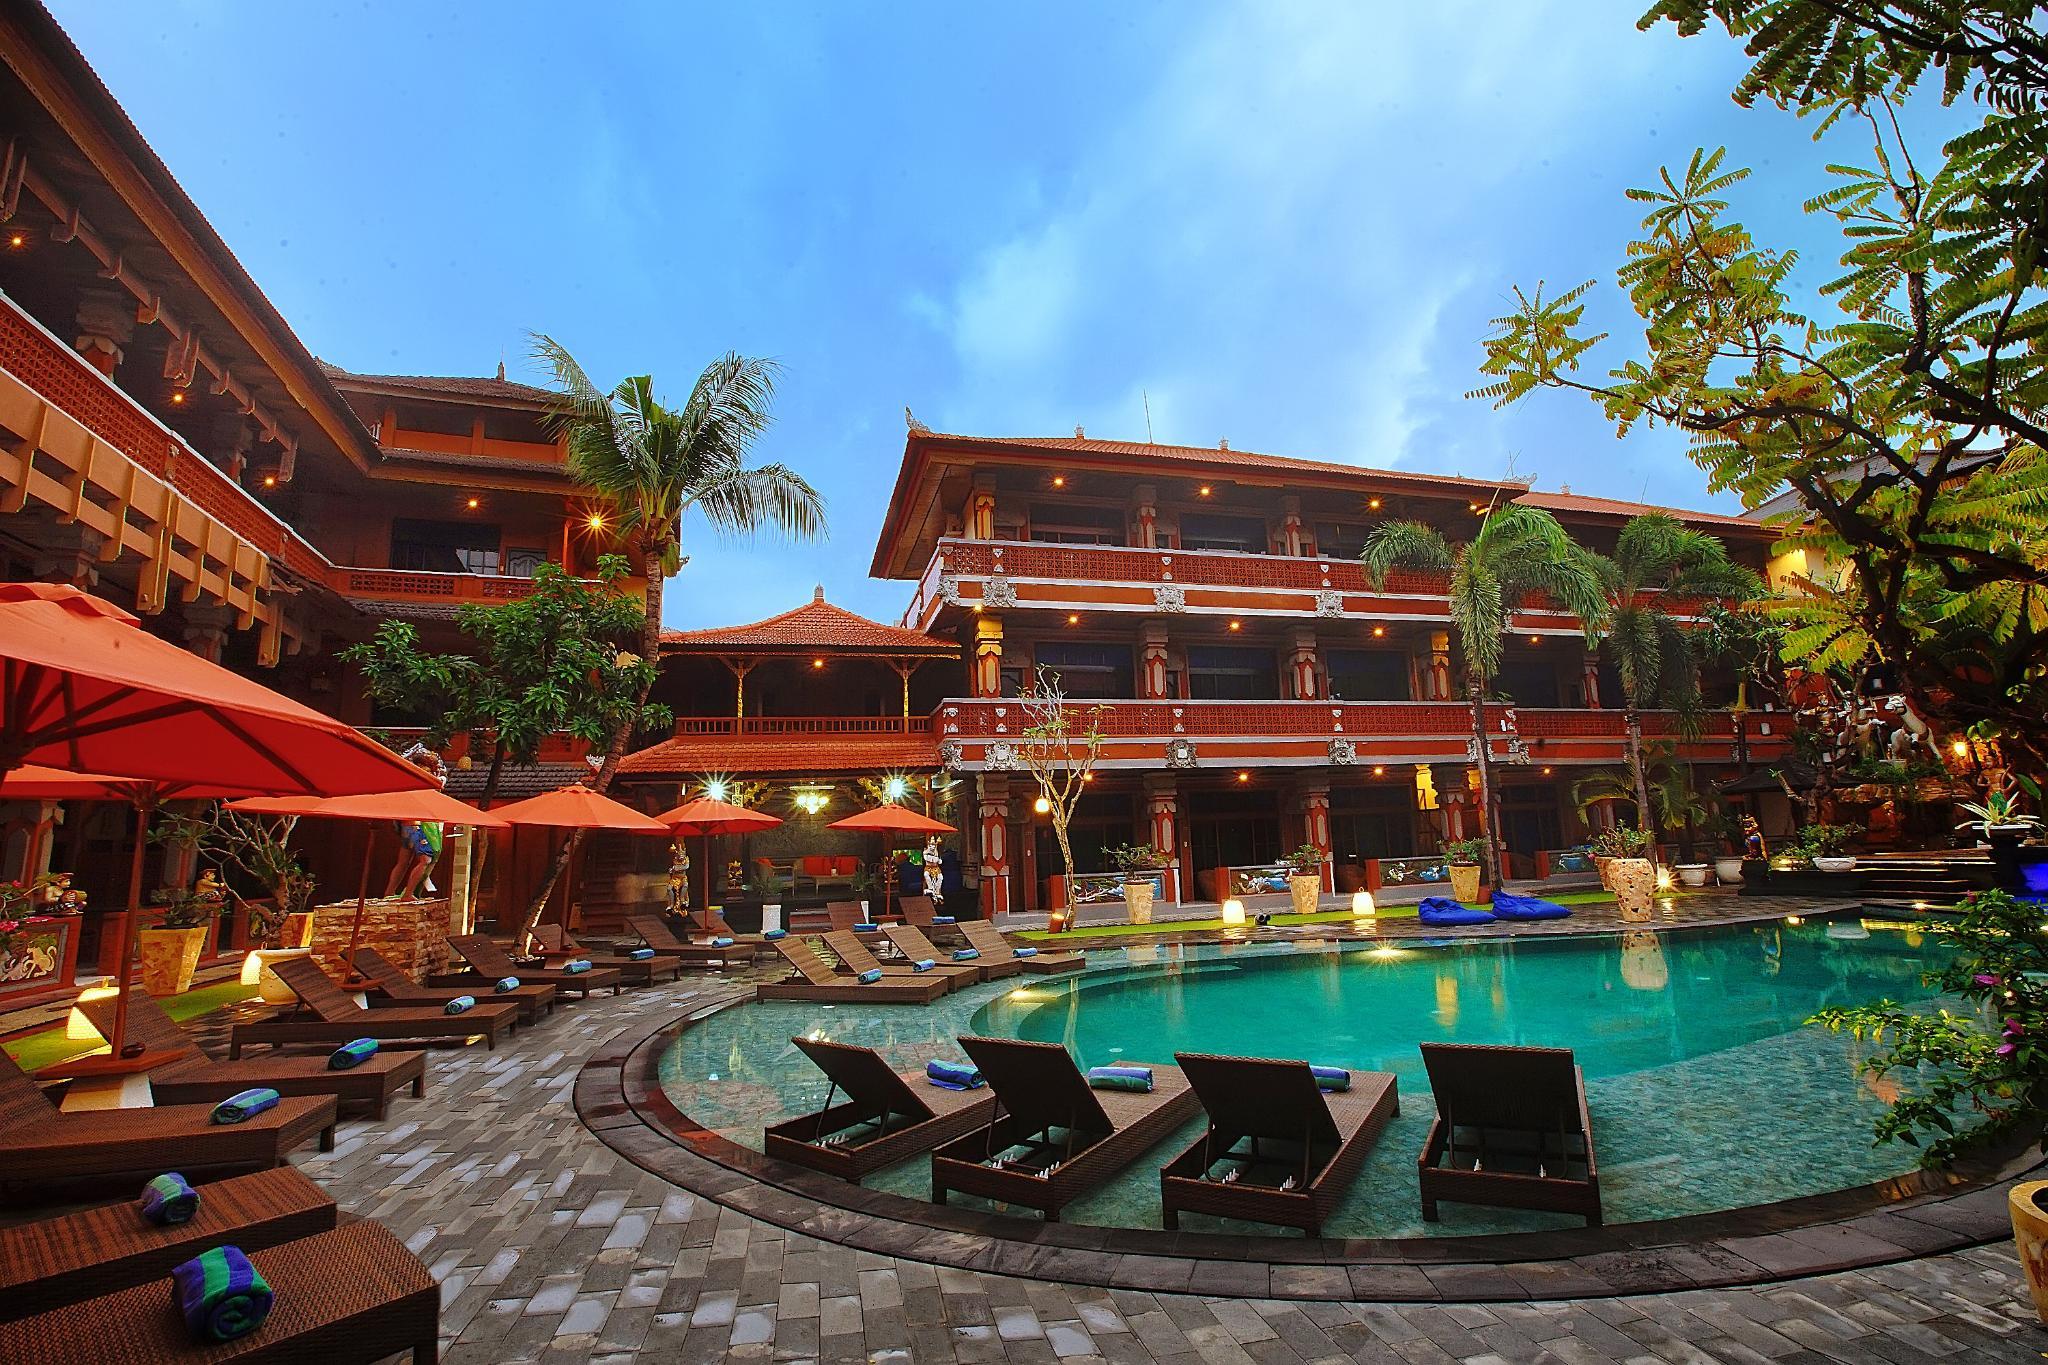 Wina Holiday Villa In Bali Indonesia Bali Hotel Booking